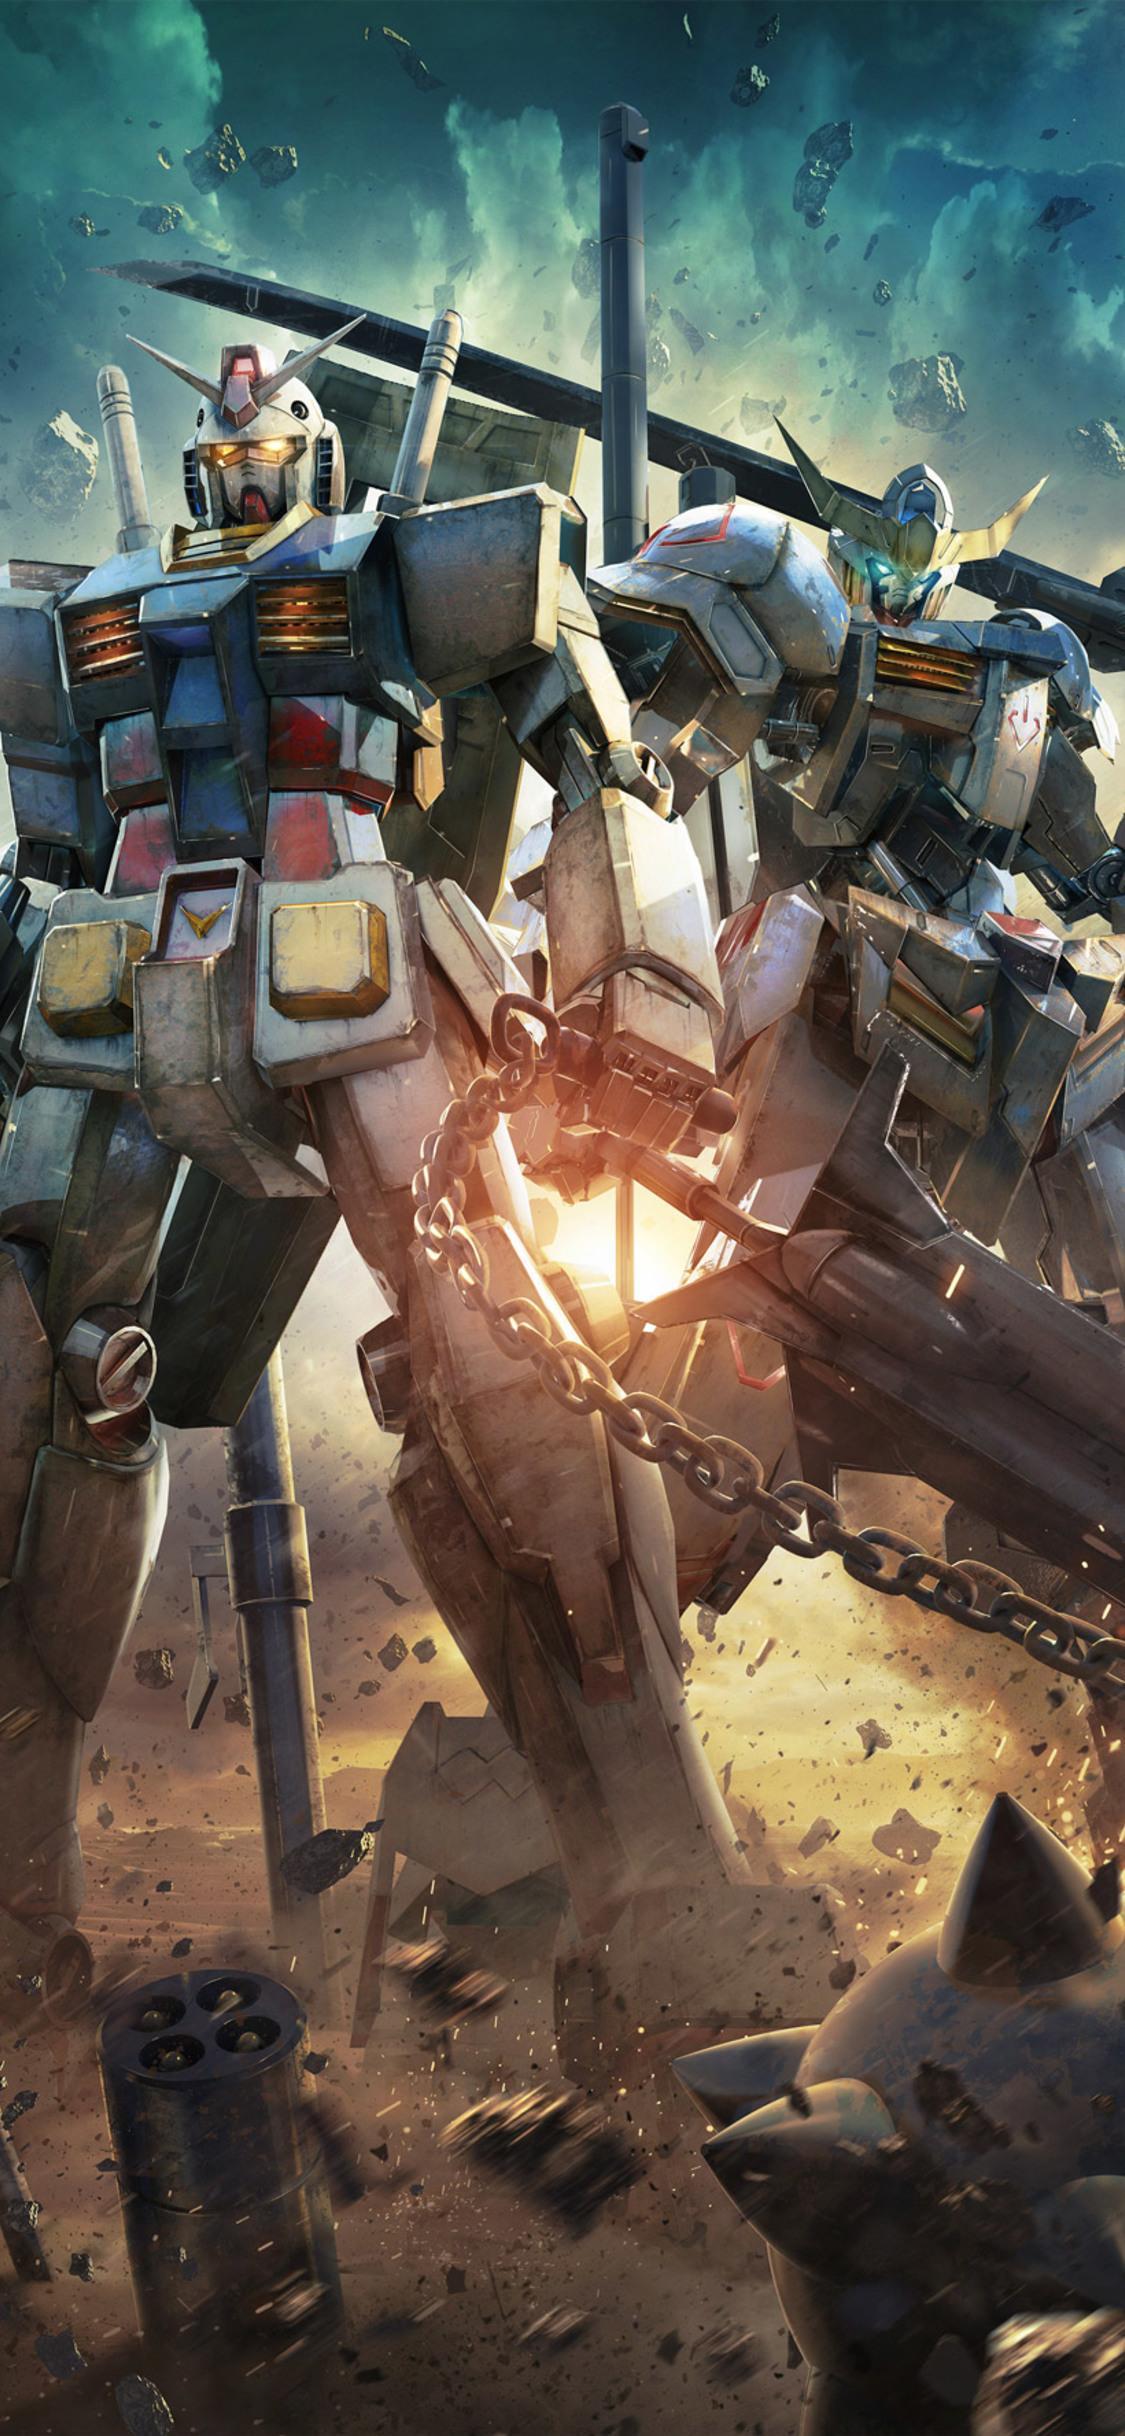 Gundam iPhone HD Wallpapers - Wallpaper Cave